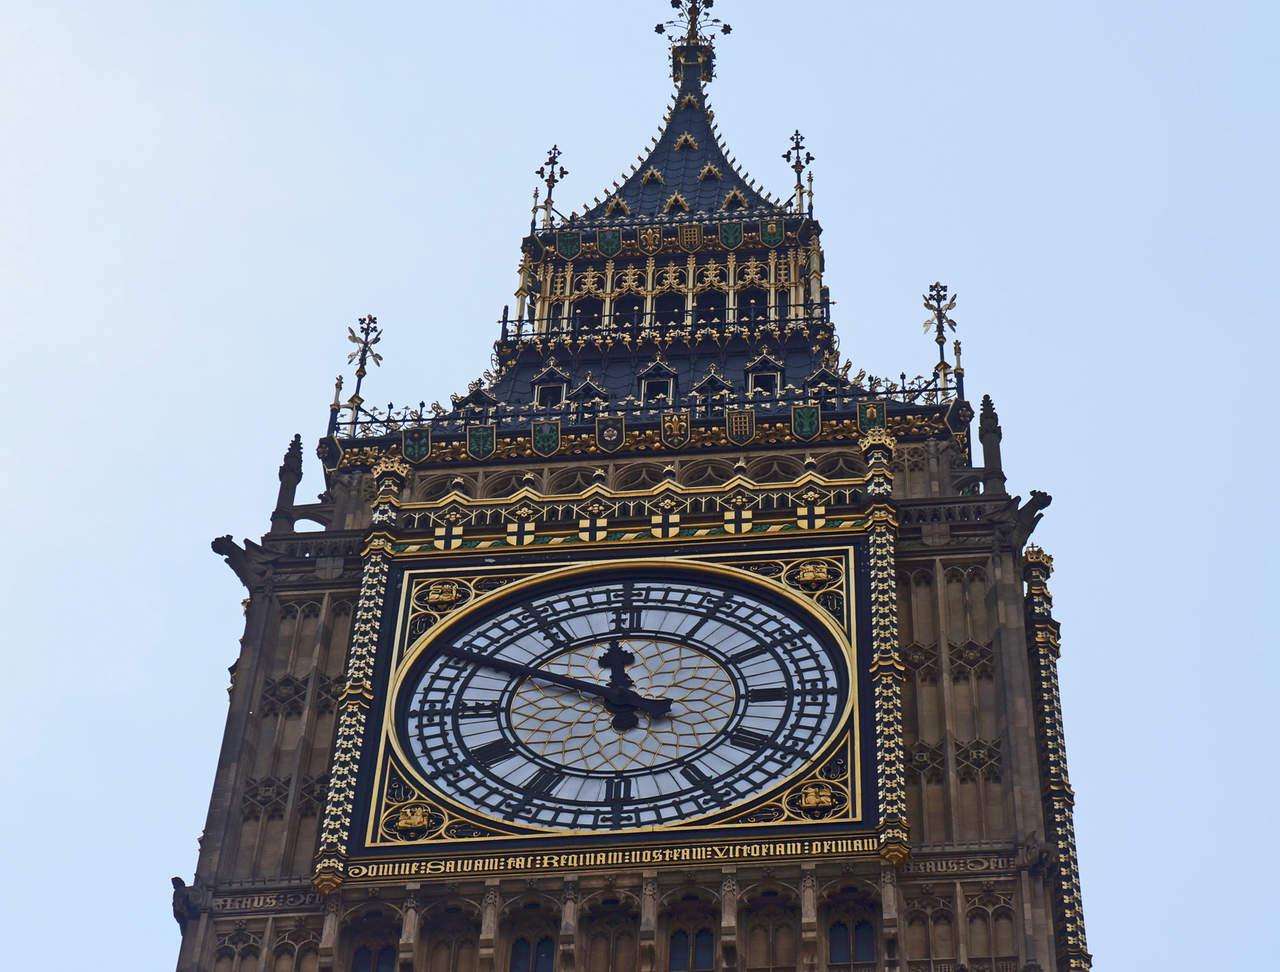 Reloj big ben smbolo histrico y turstico de reino unido malvernweather Choice Image